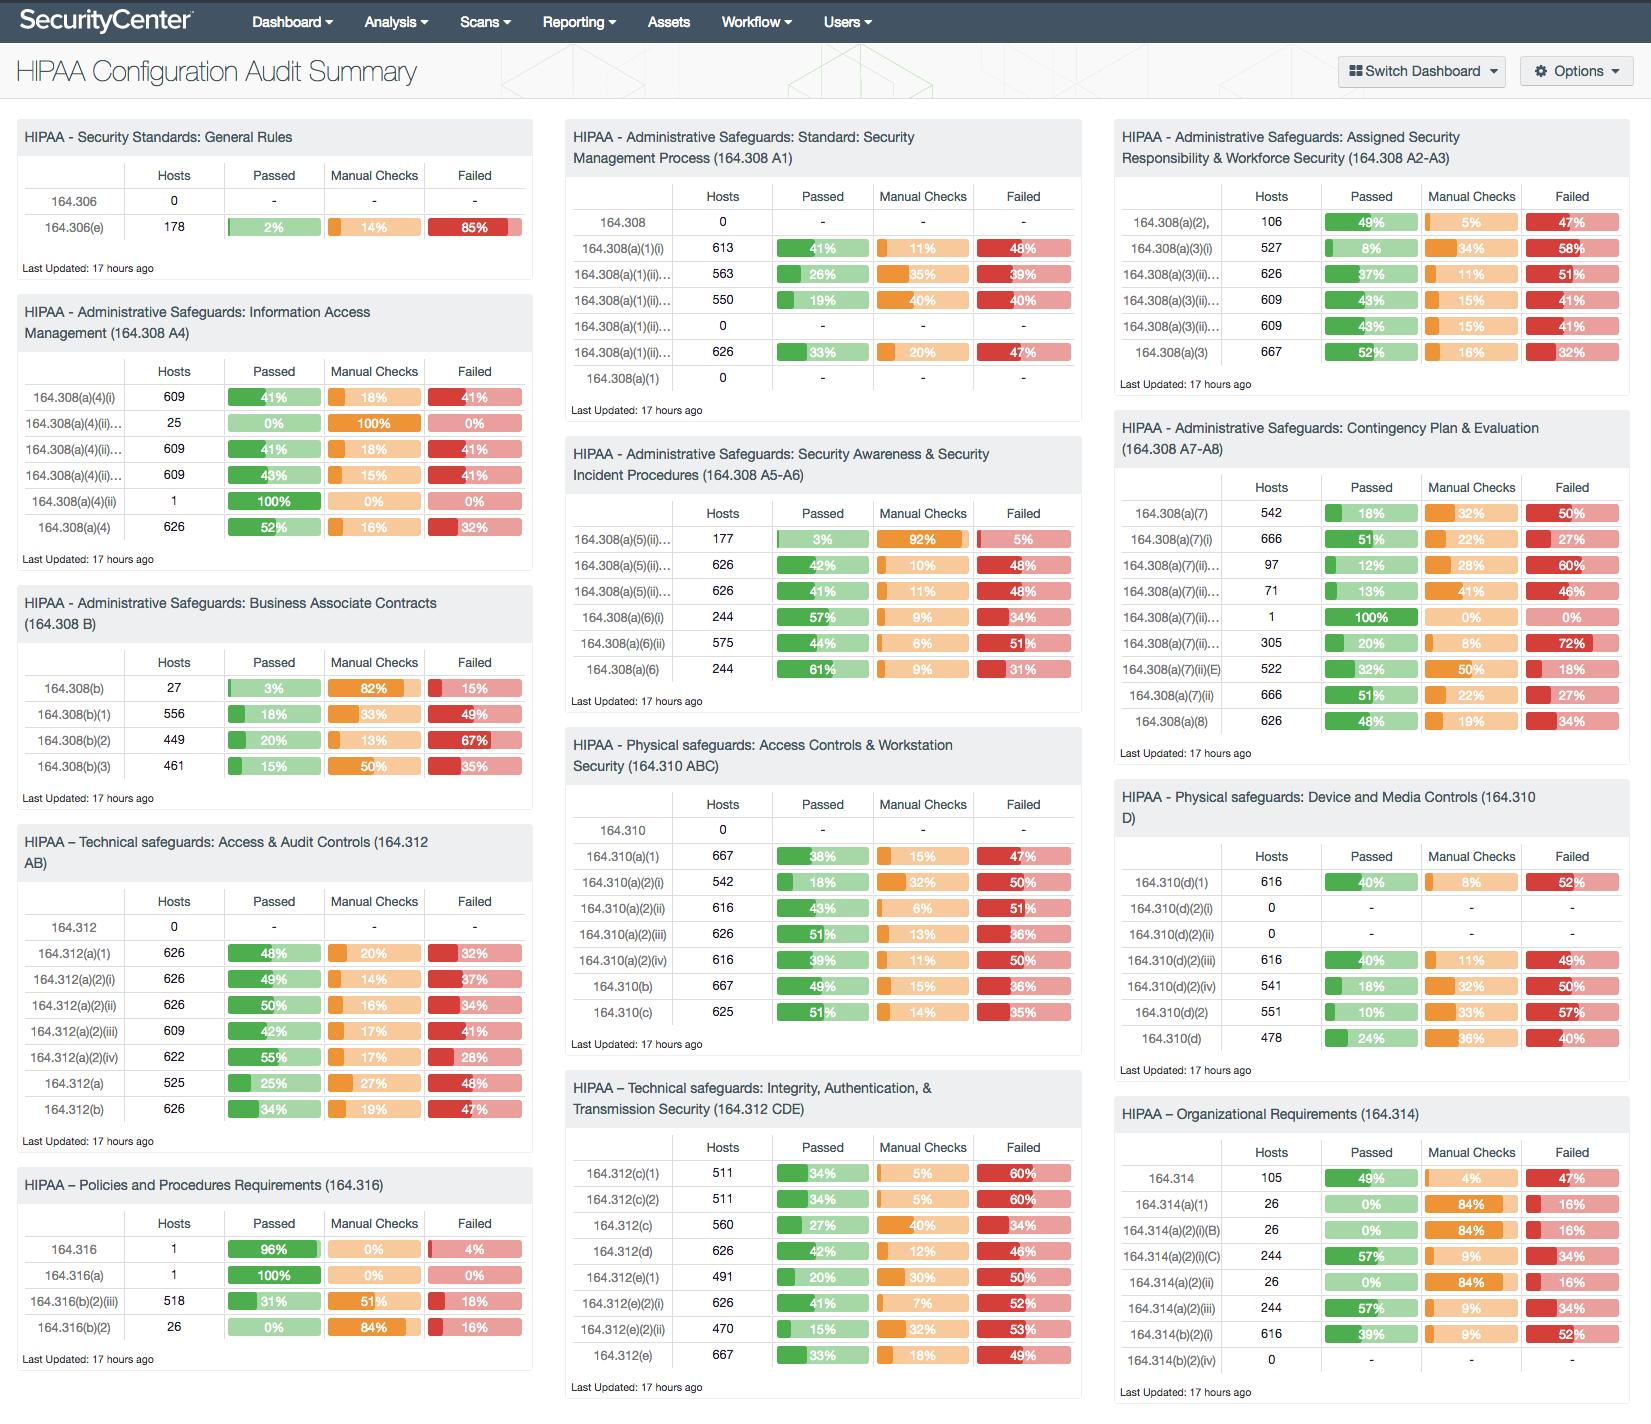 HIPAA Configuration Audit Summary Dashboard